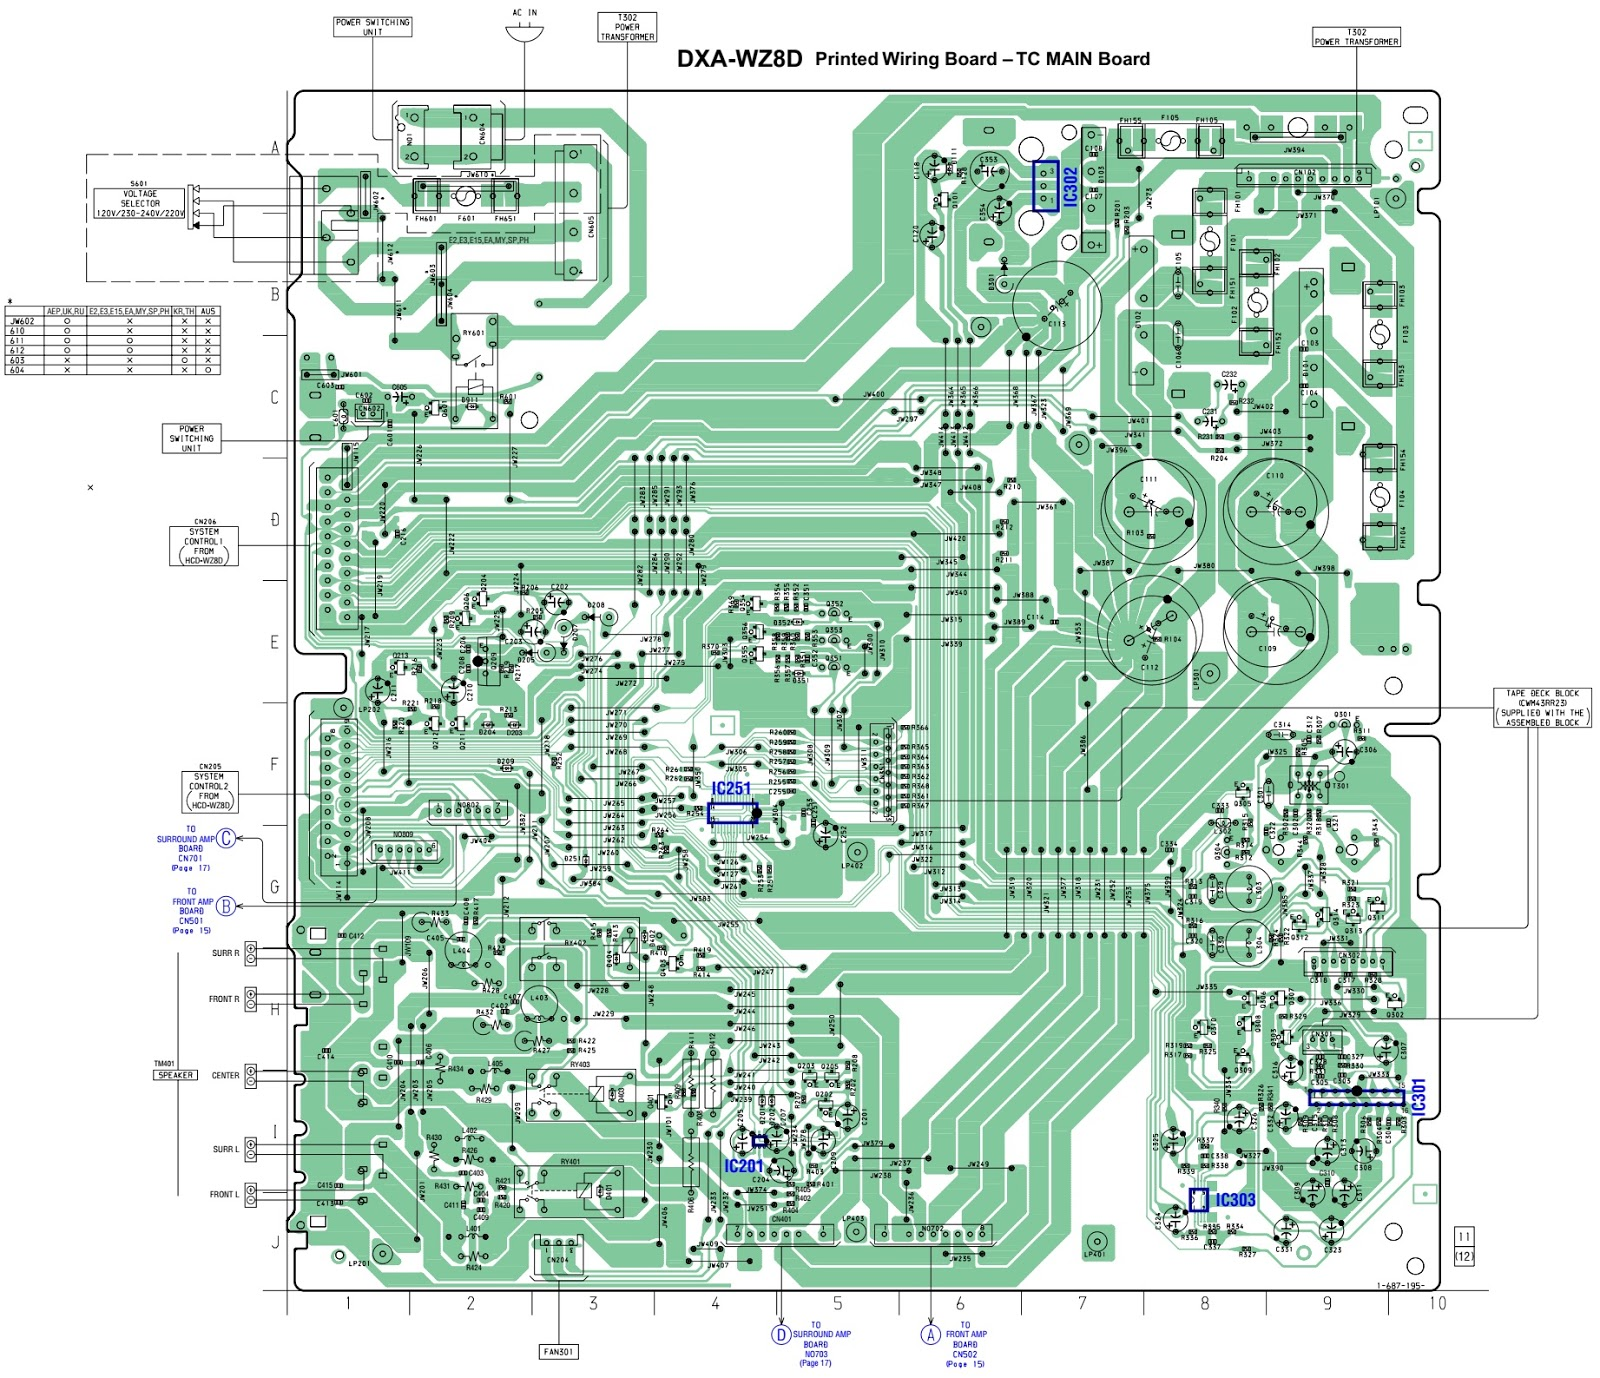 sony dxa wz8d main board circuit diagram 1of 2 [ 1600 x 1378 Pixel ]